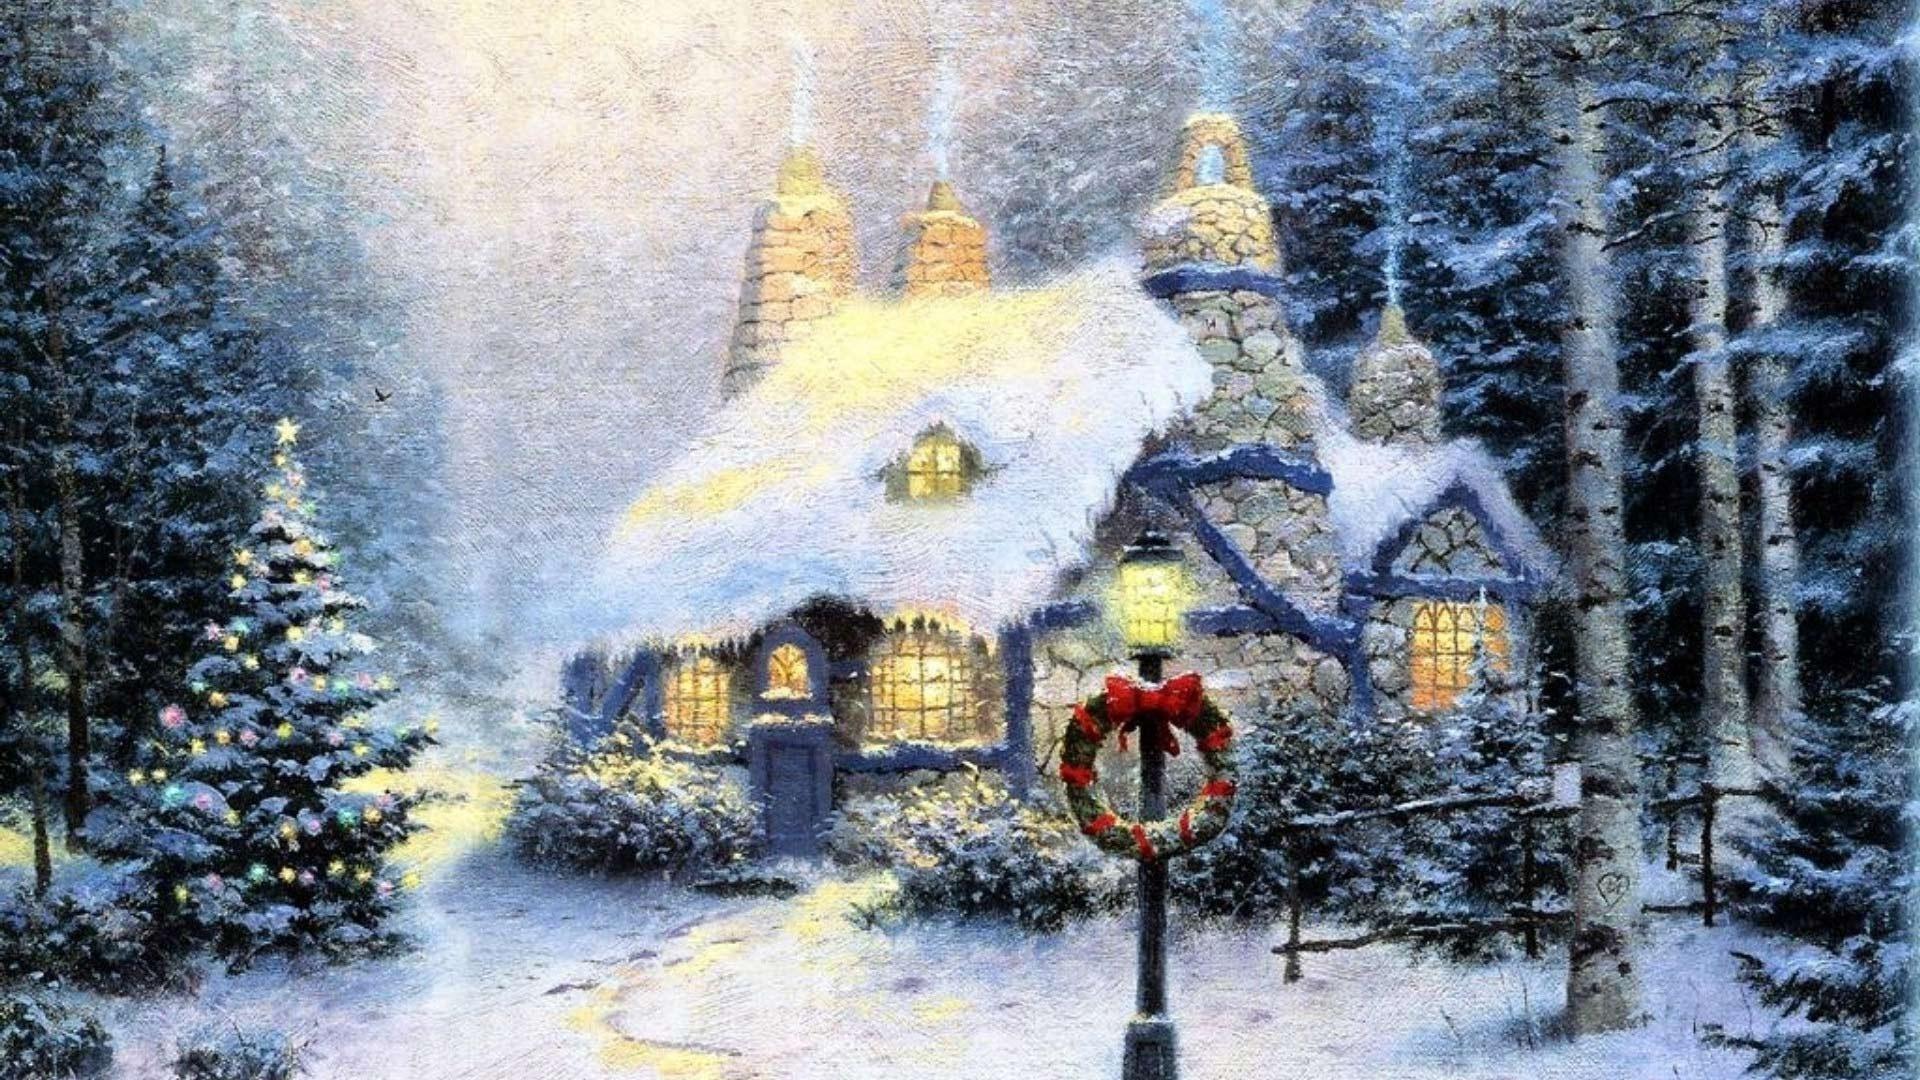 рождество, лес, зима, дом, фонарь, венок, свет